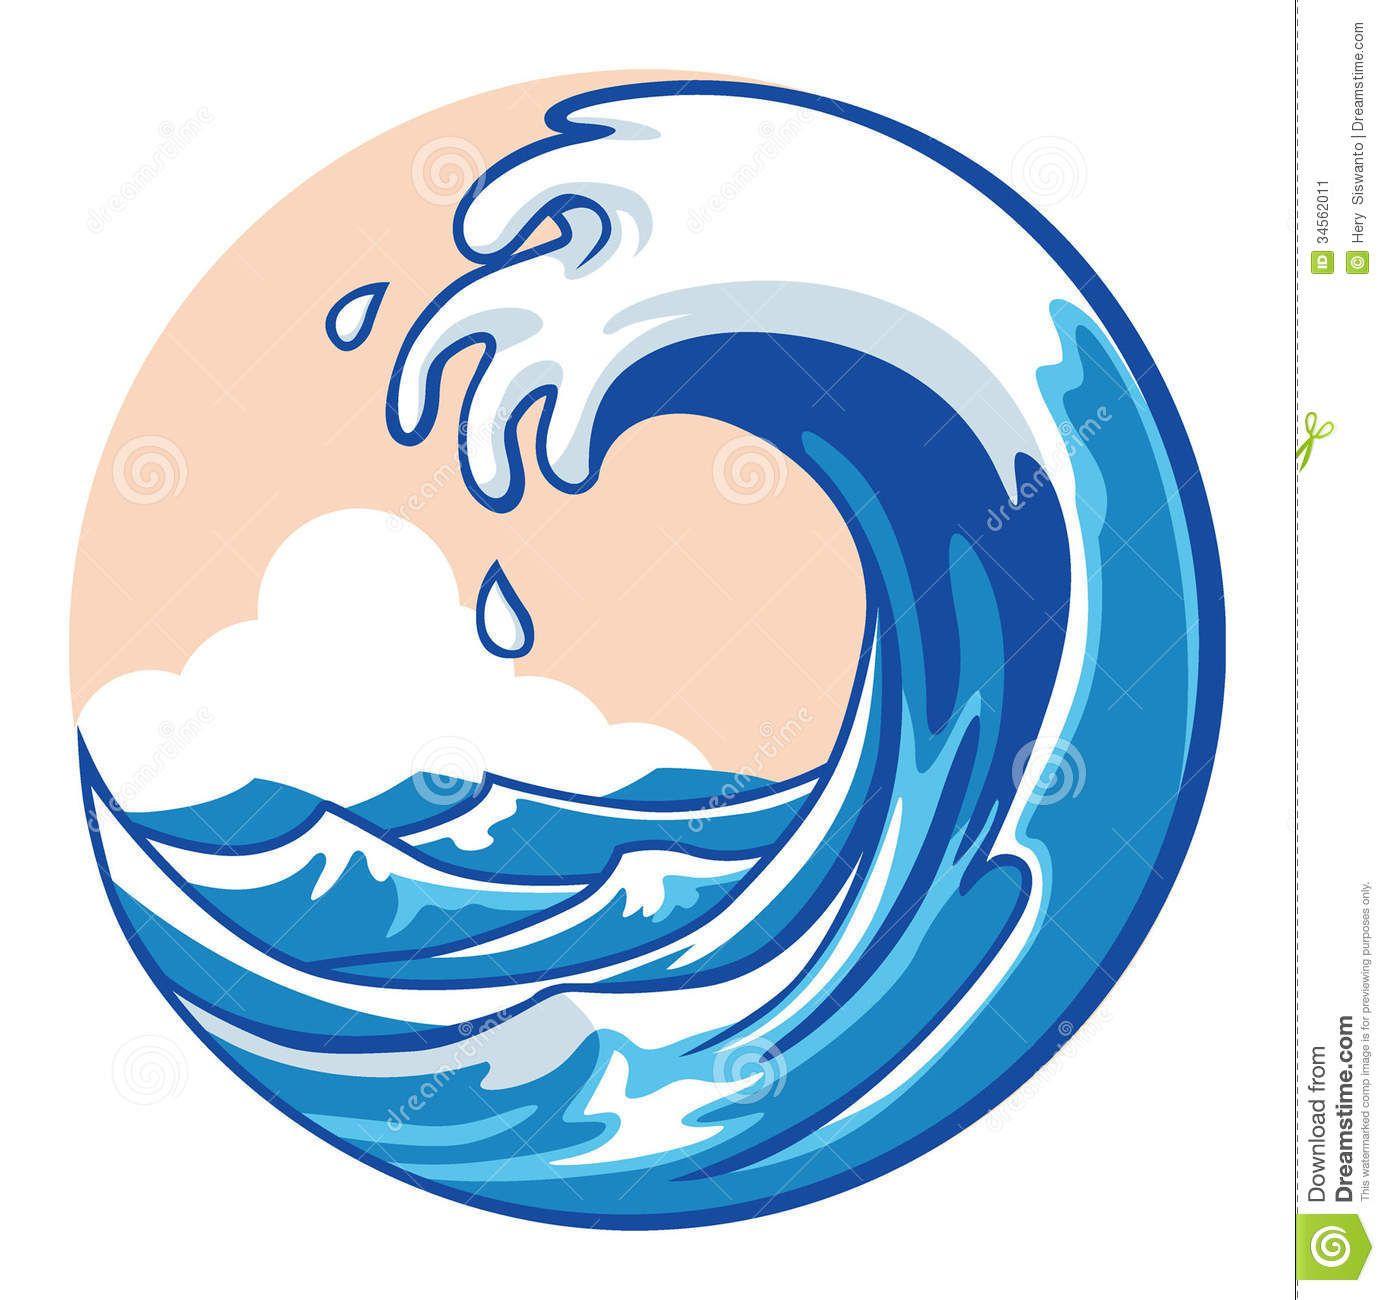 Ocean wave stock photos. Clipart waves easy